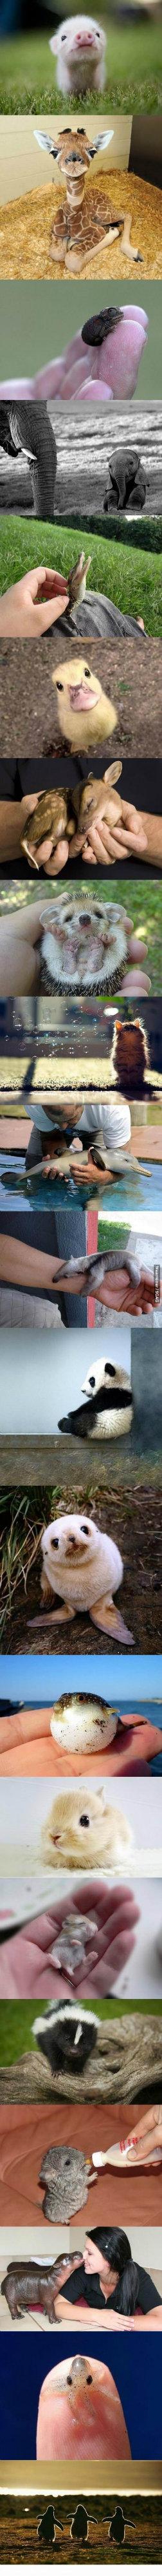 D'awwwwww. Cute animal babies .. far cuter than human babies